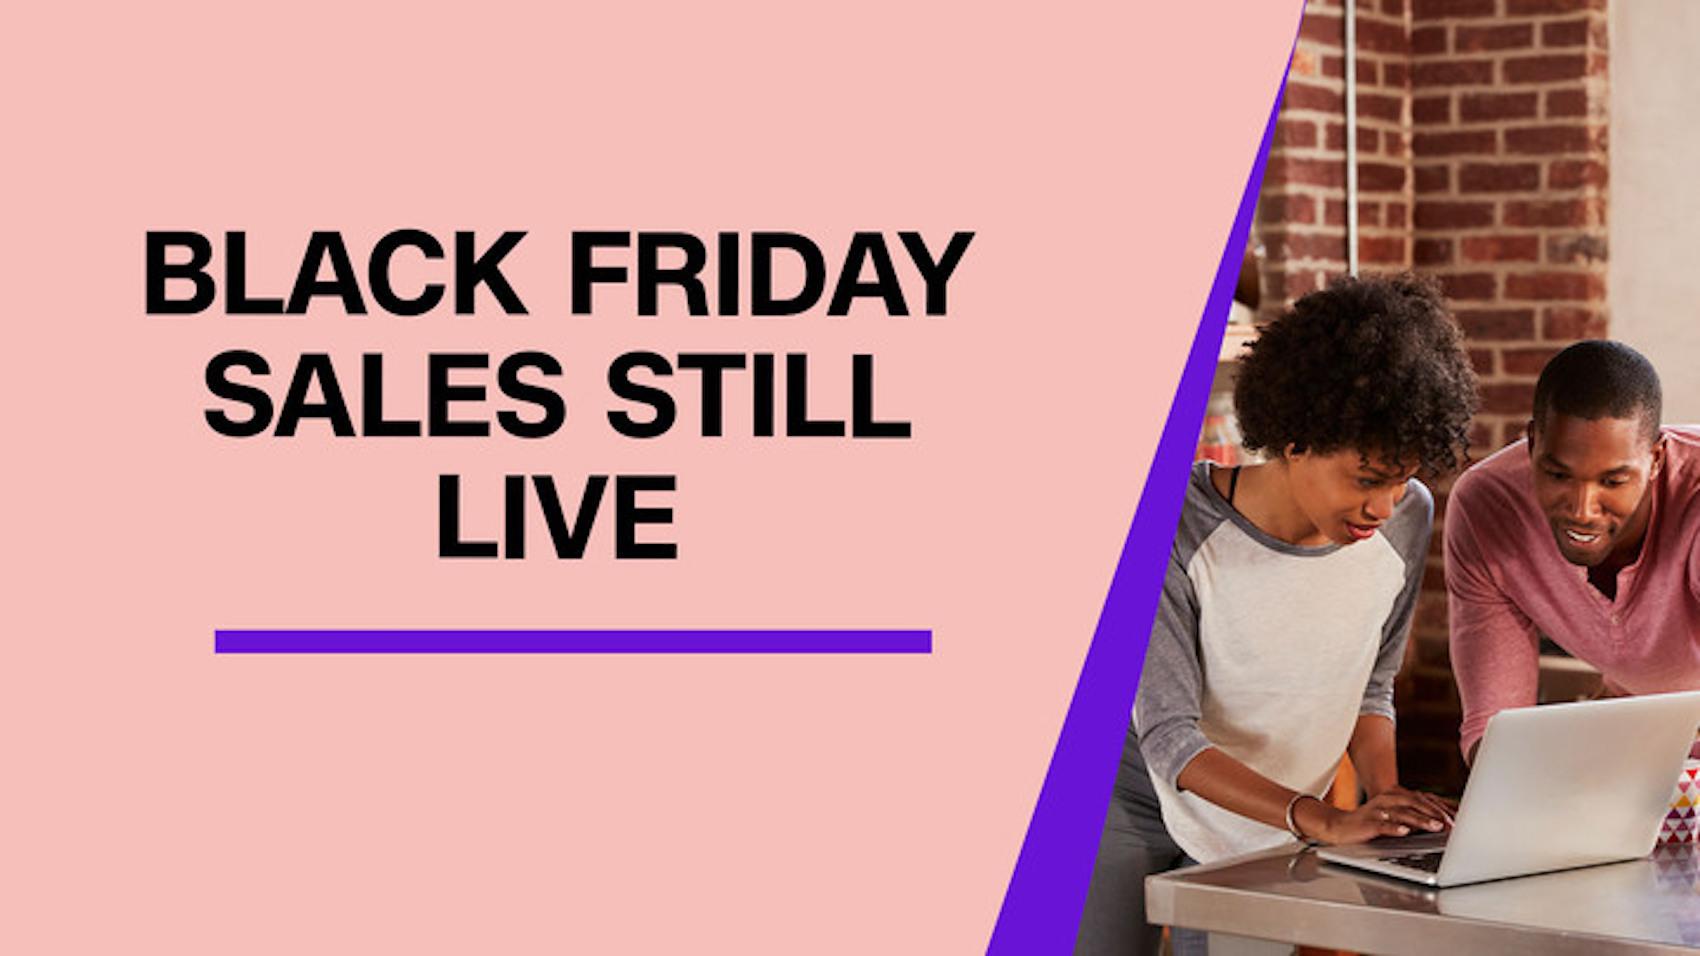 Black Friday Sales Deals 2020 Sales Are Still Live Cnn Underscored